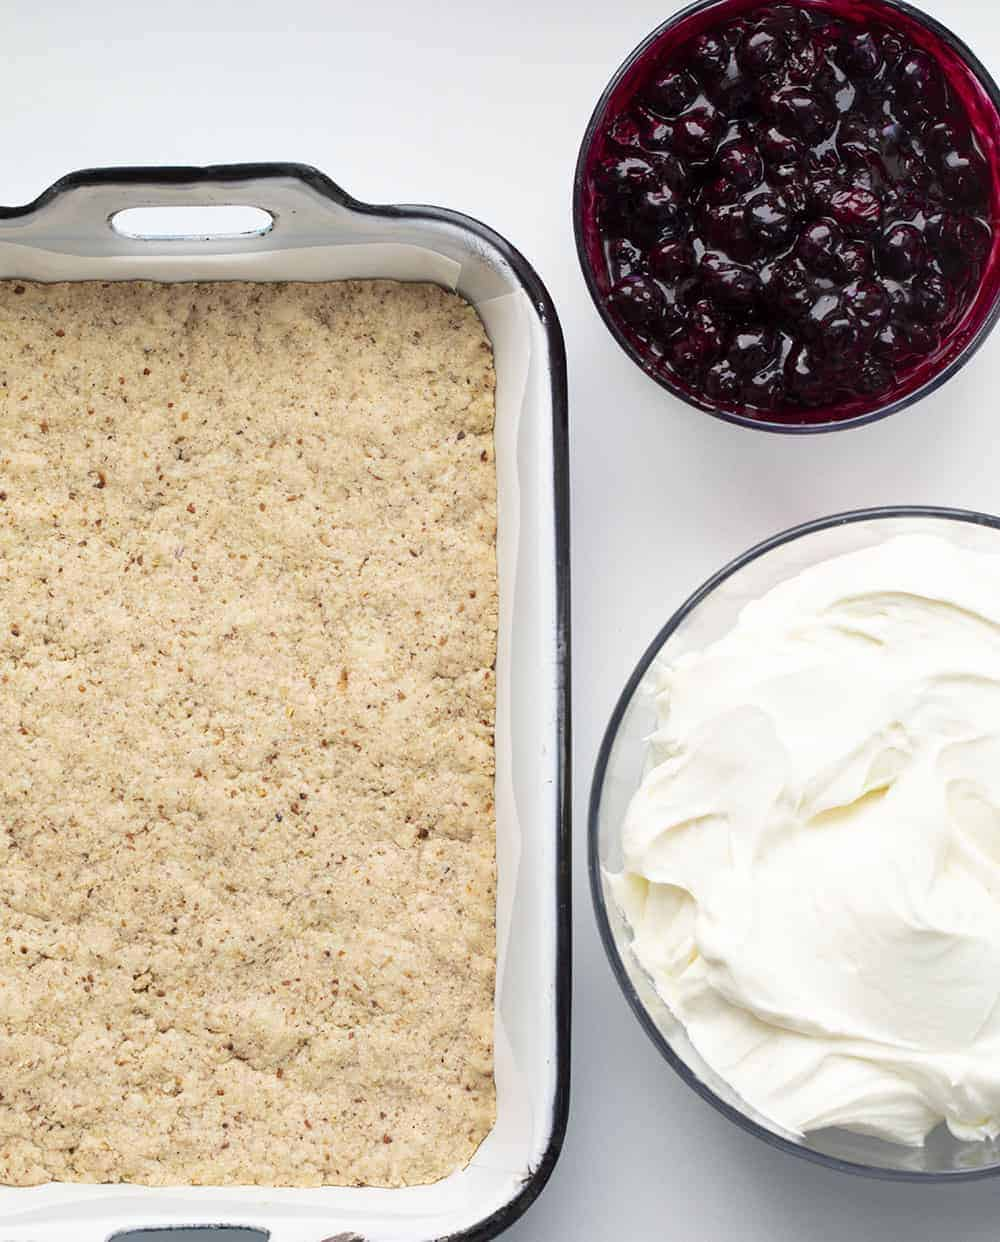 Ingredients for Blueberry Jamboree Recipe